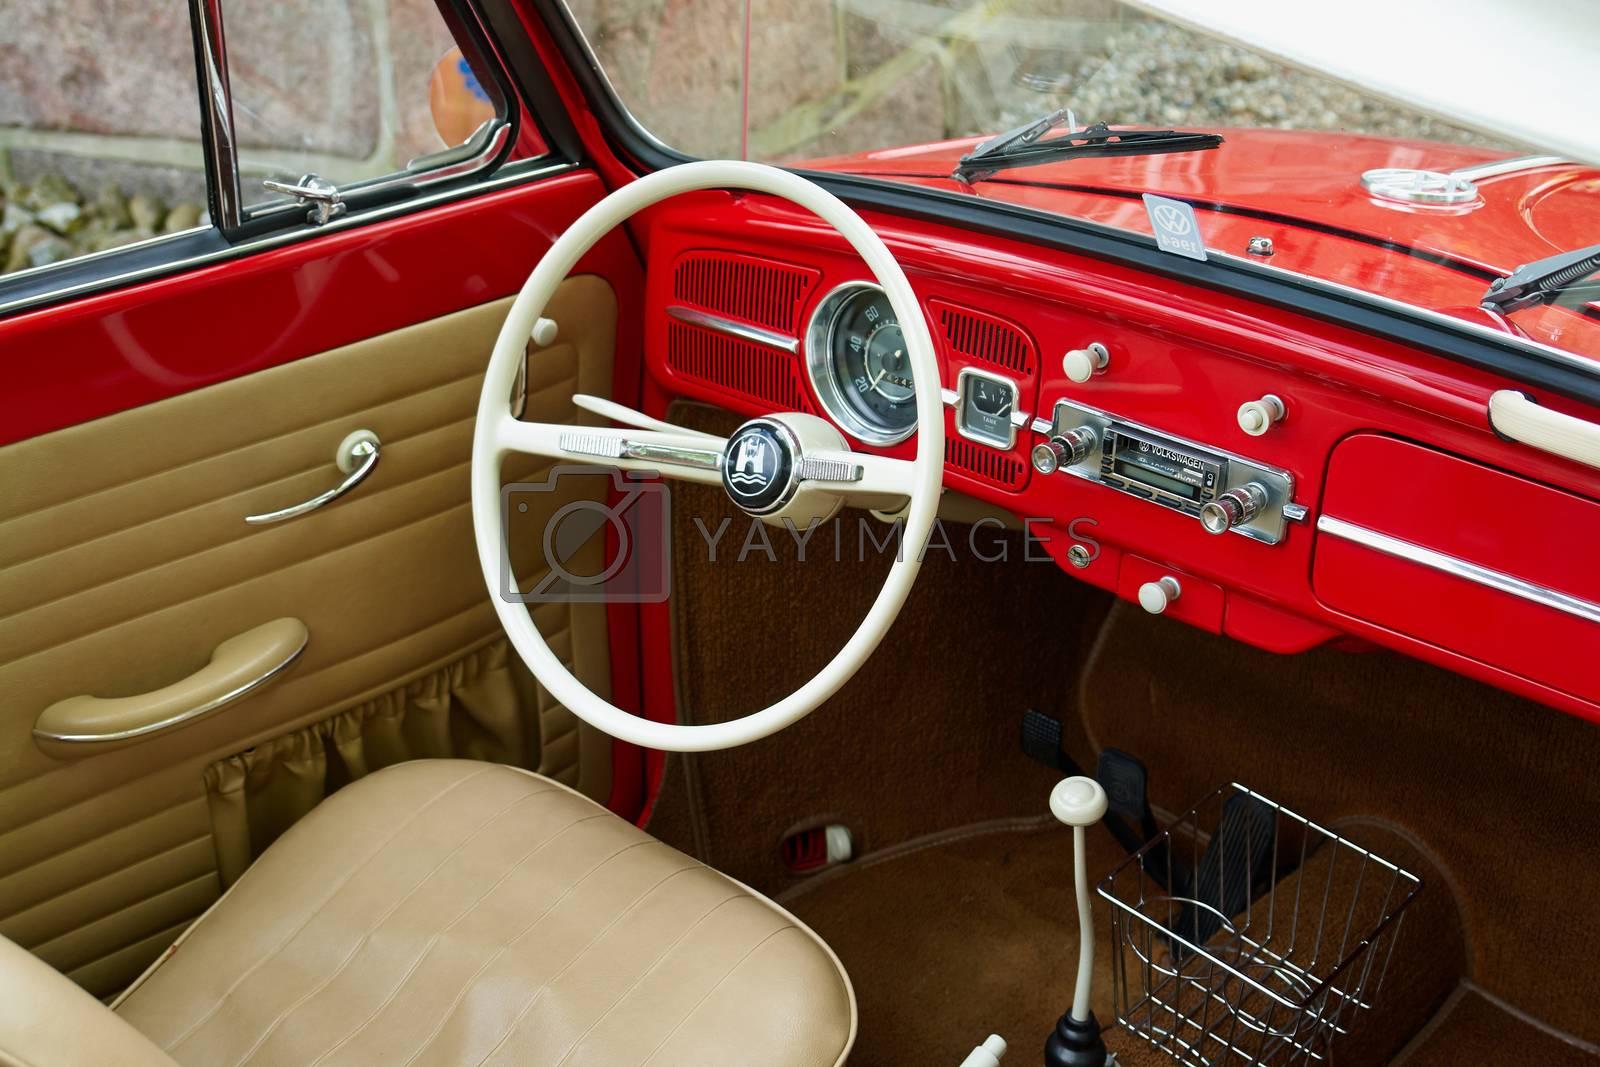 Royalty free image of Inside German motor car Volkswagen Beetle by Ronyzmbow